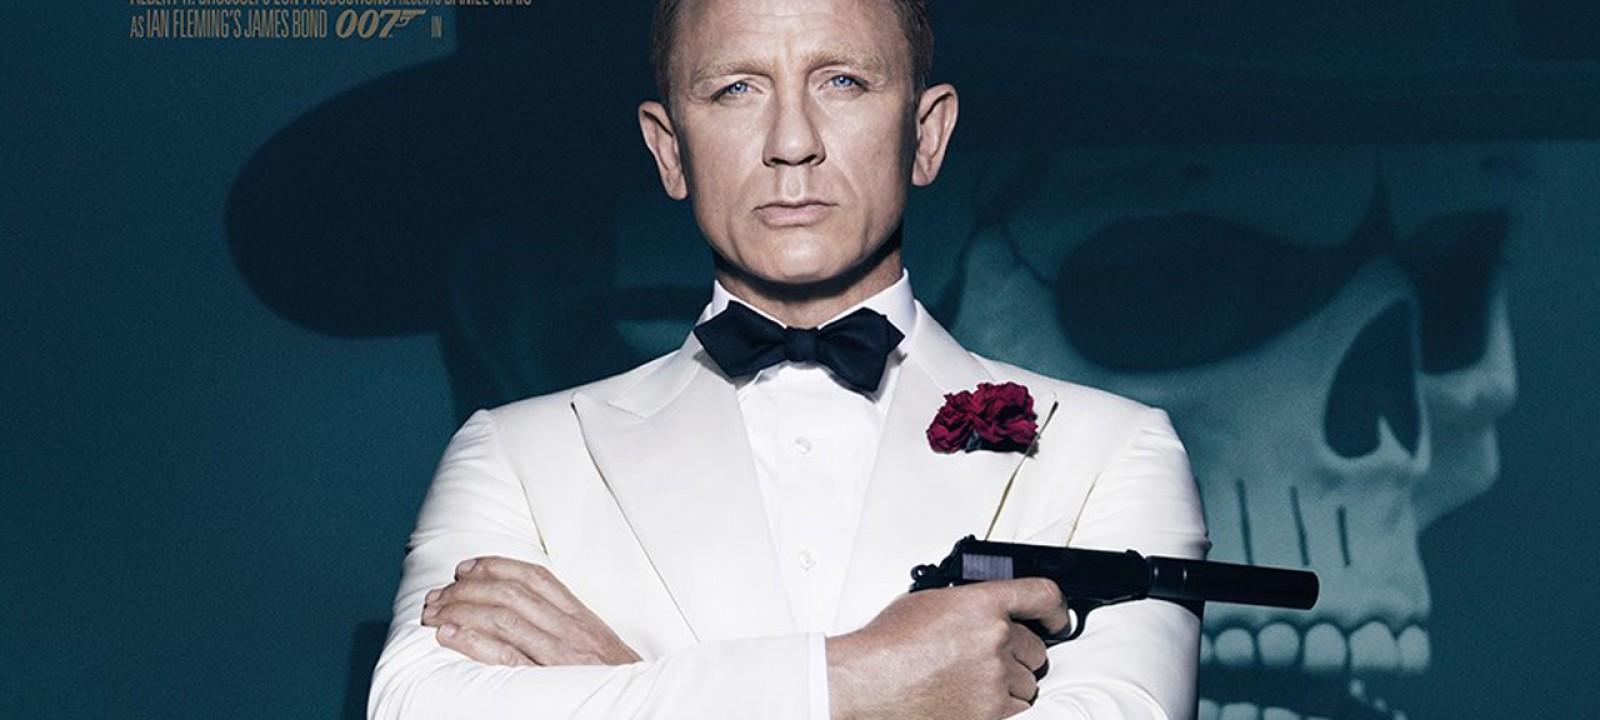 Daniel Craig in 'SPECTRE' (Photo: Eon Productions)